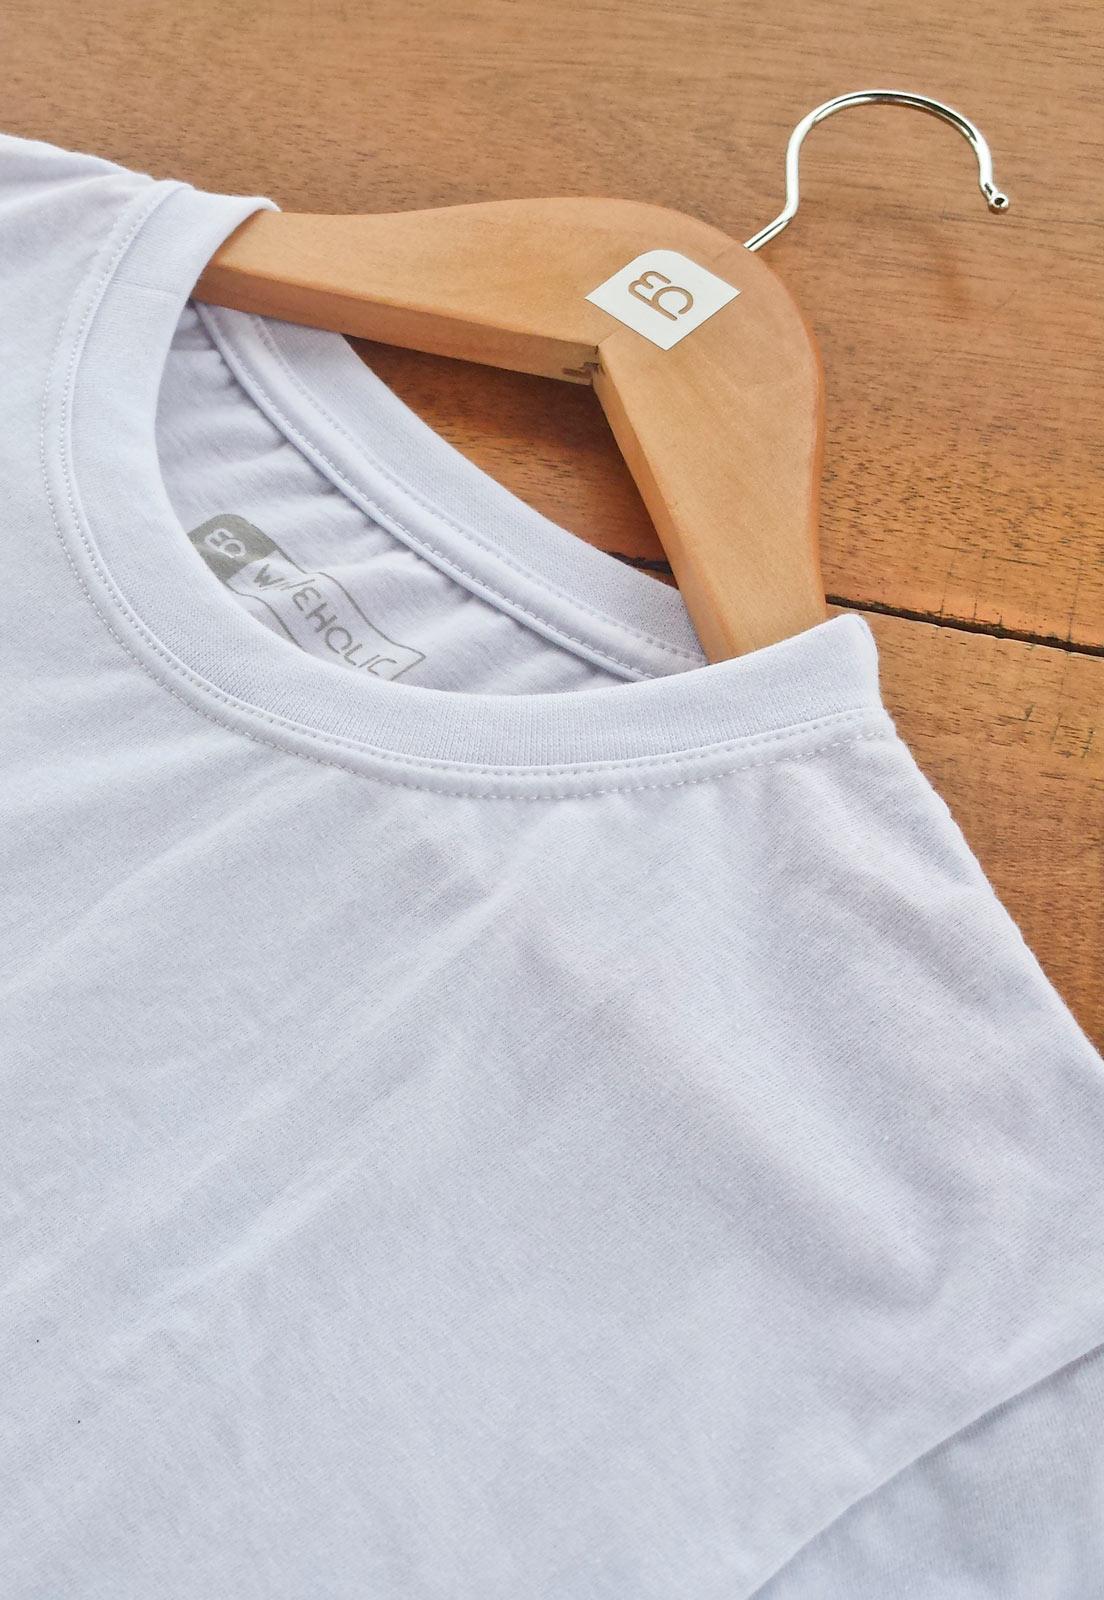 Camiseta básica champagne sustentável que preserva